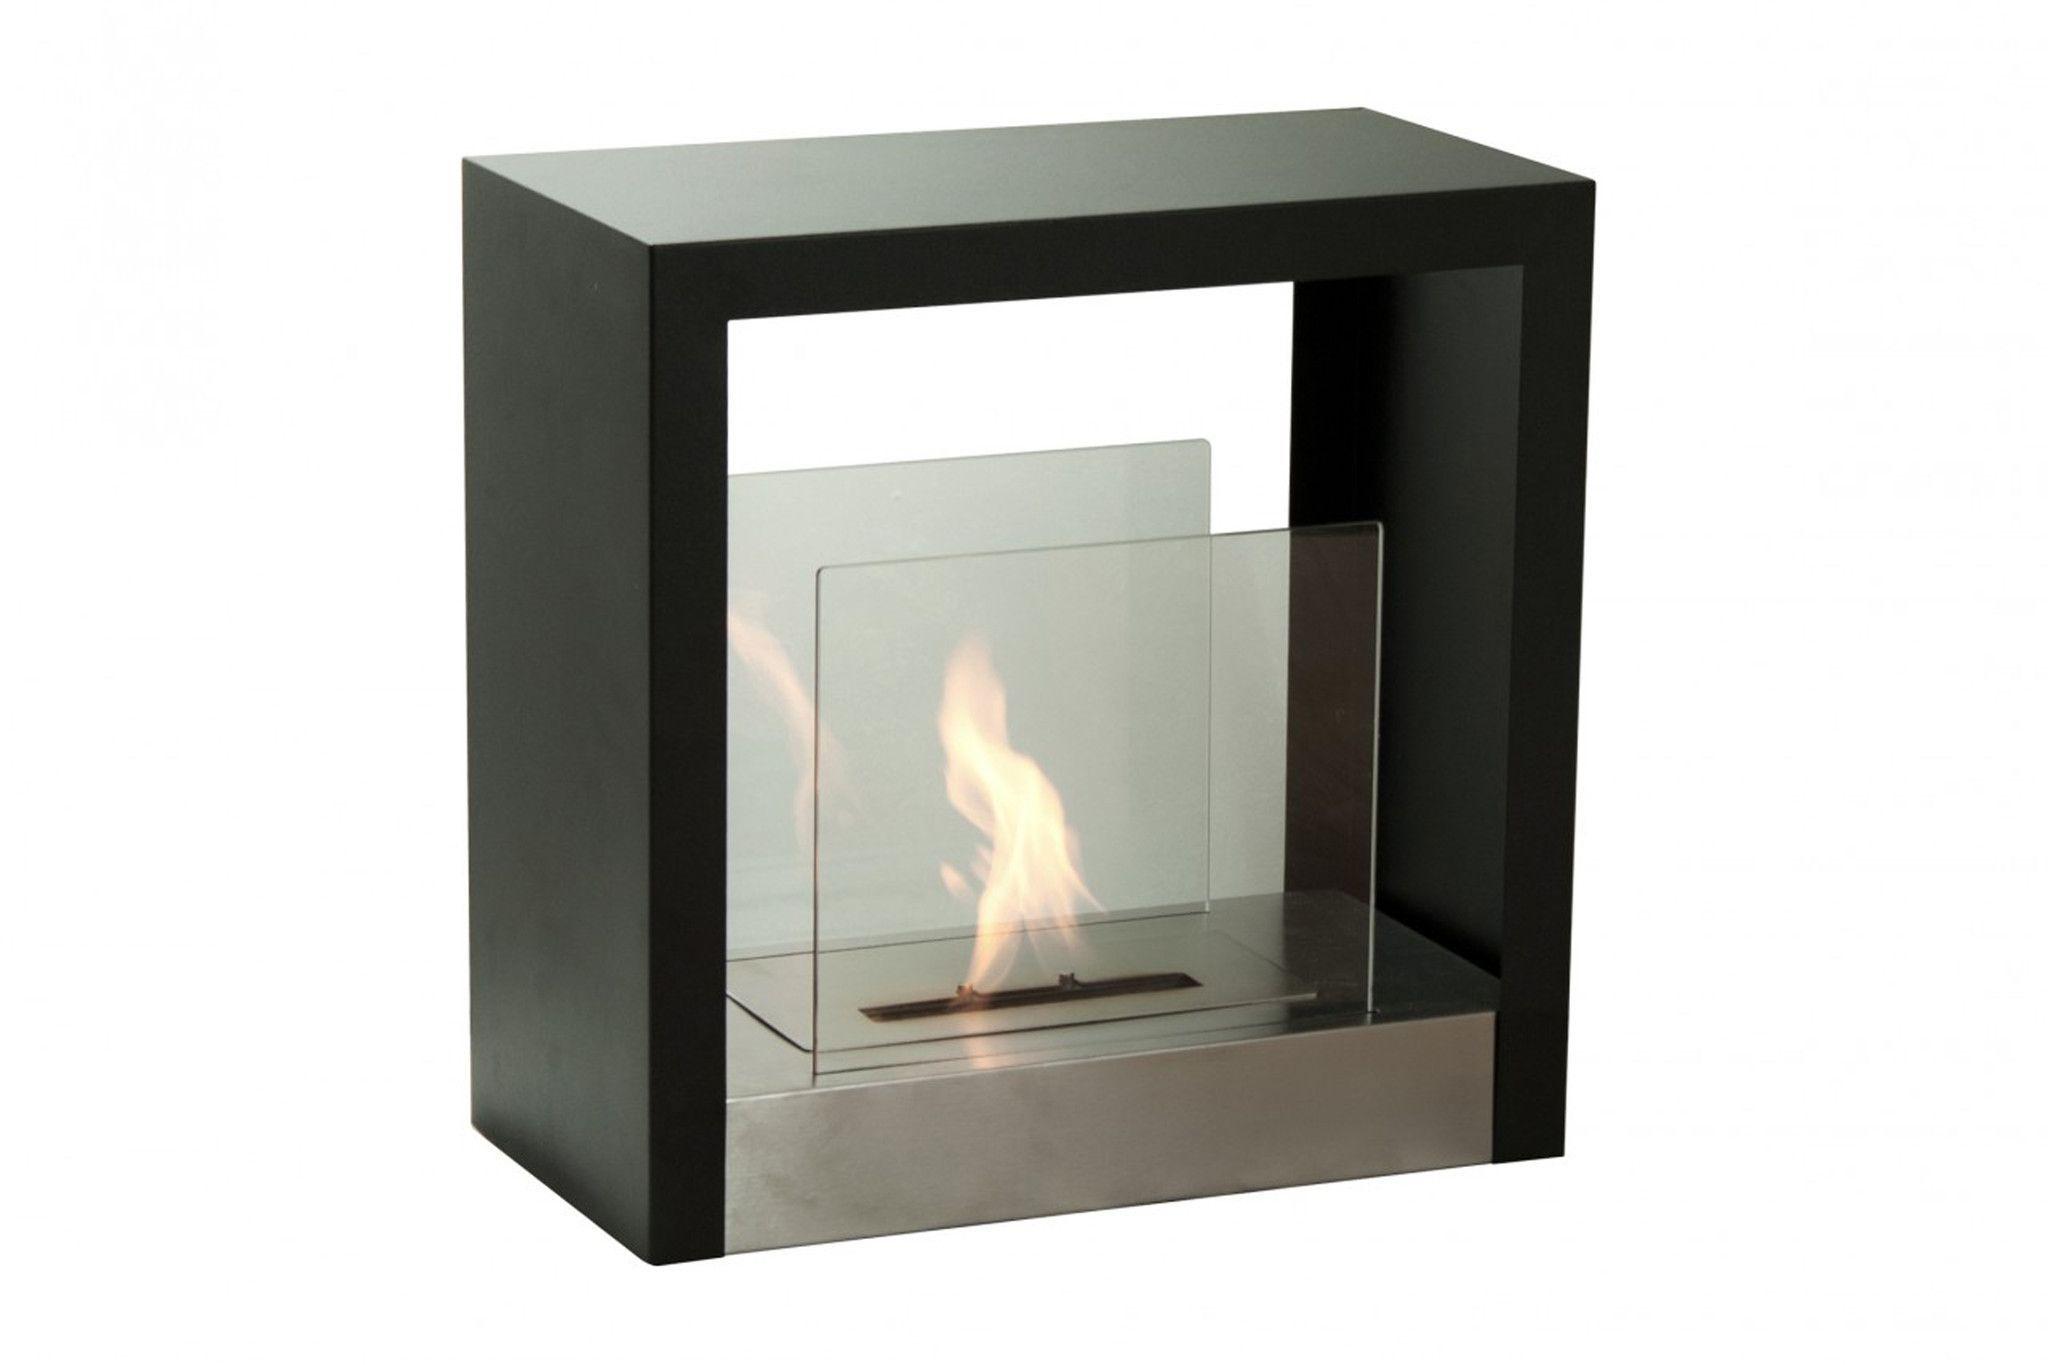 tectum s freestanding ventless ethanol fireplace pinterest